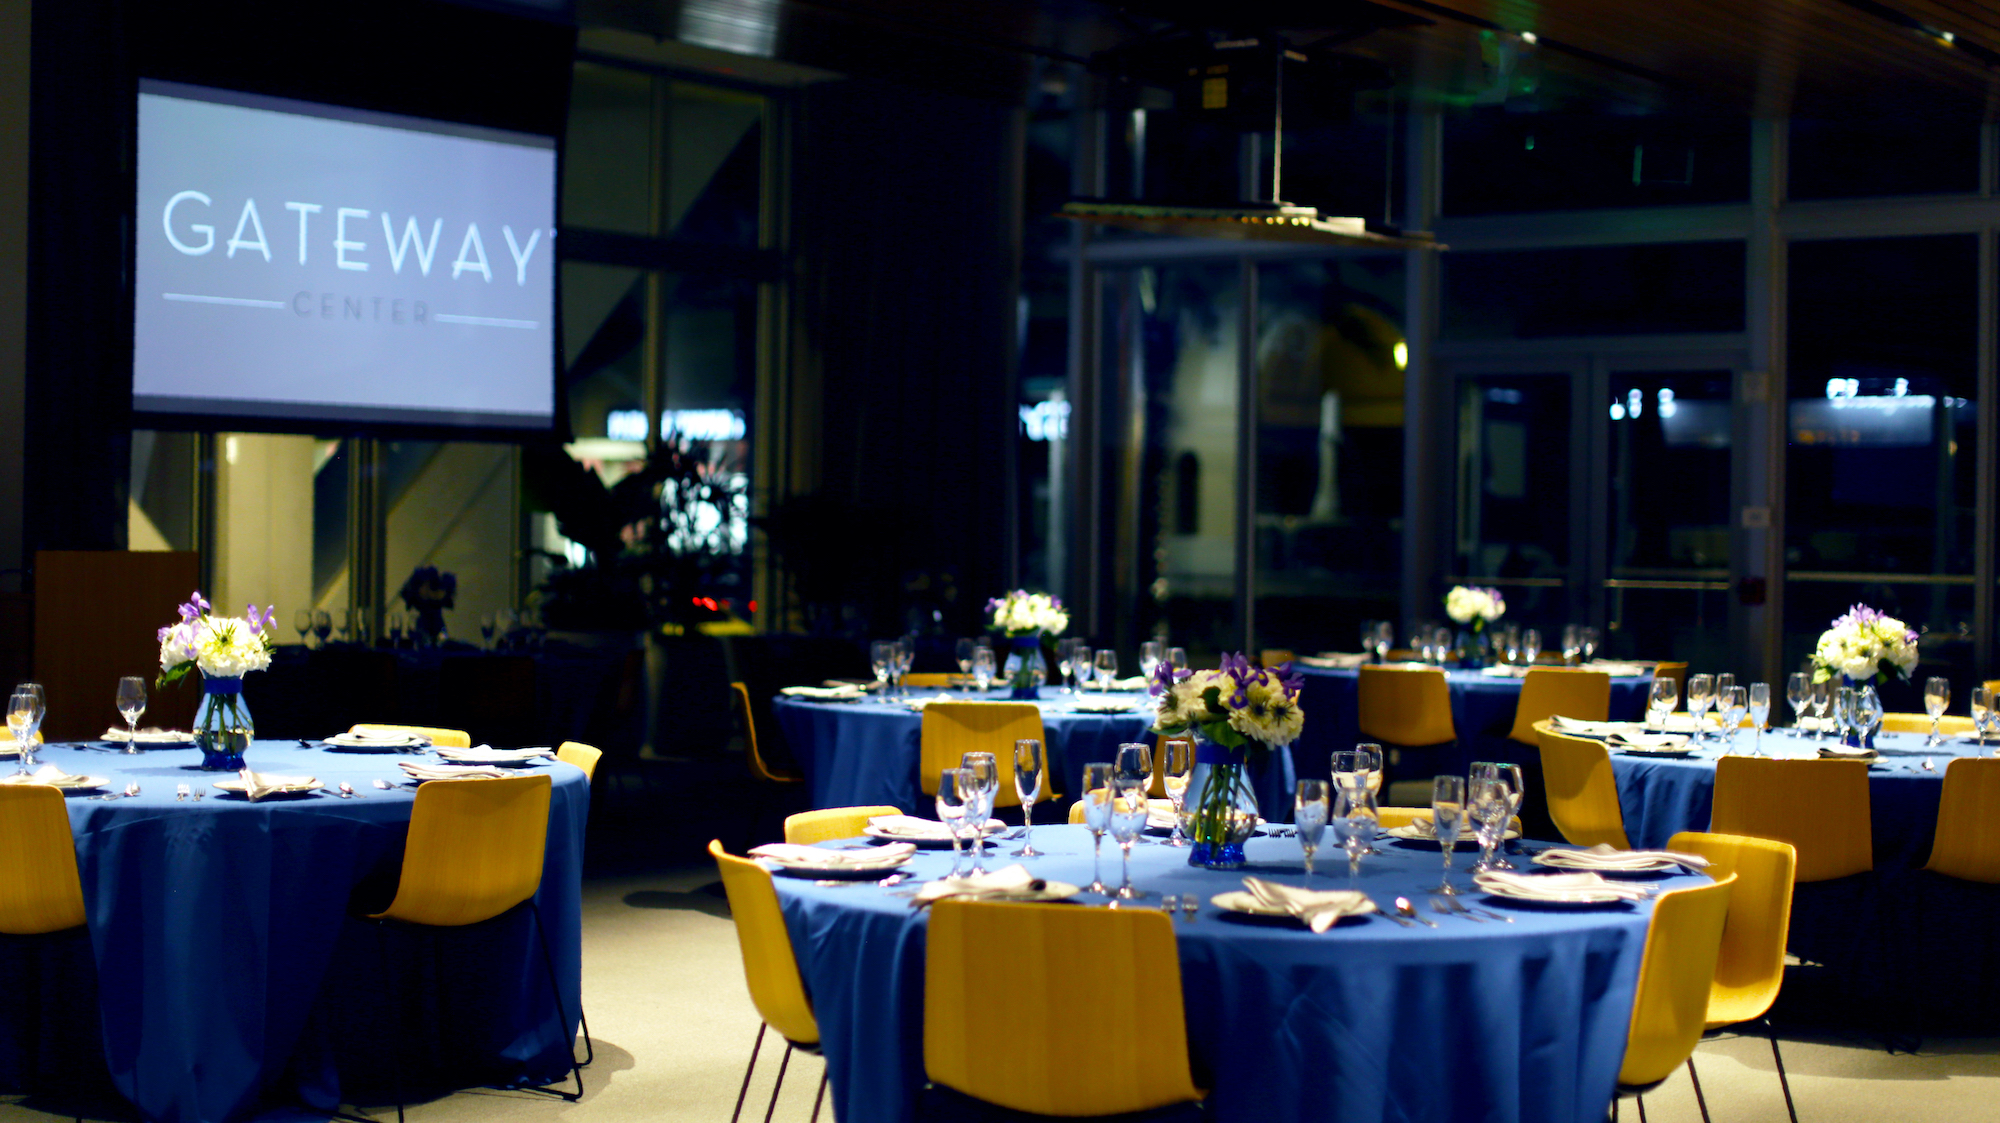 Gateway Center ballroom decorated at nighttime